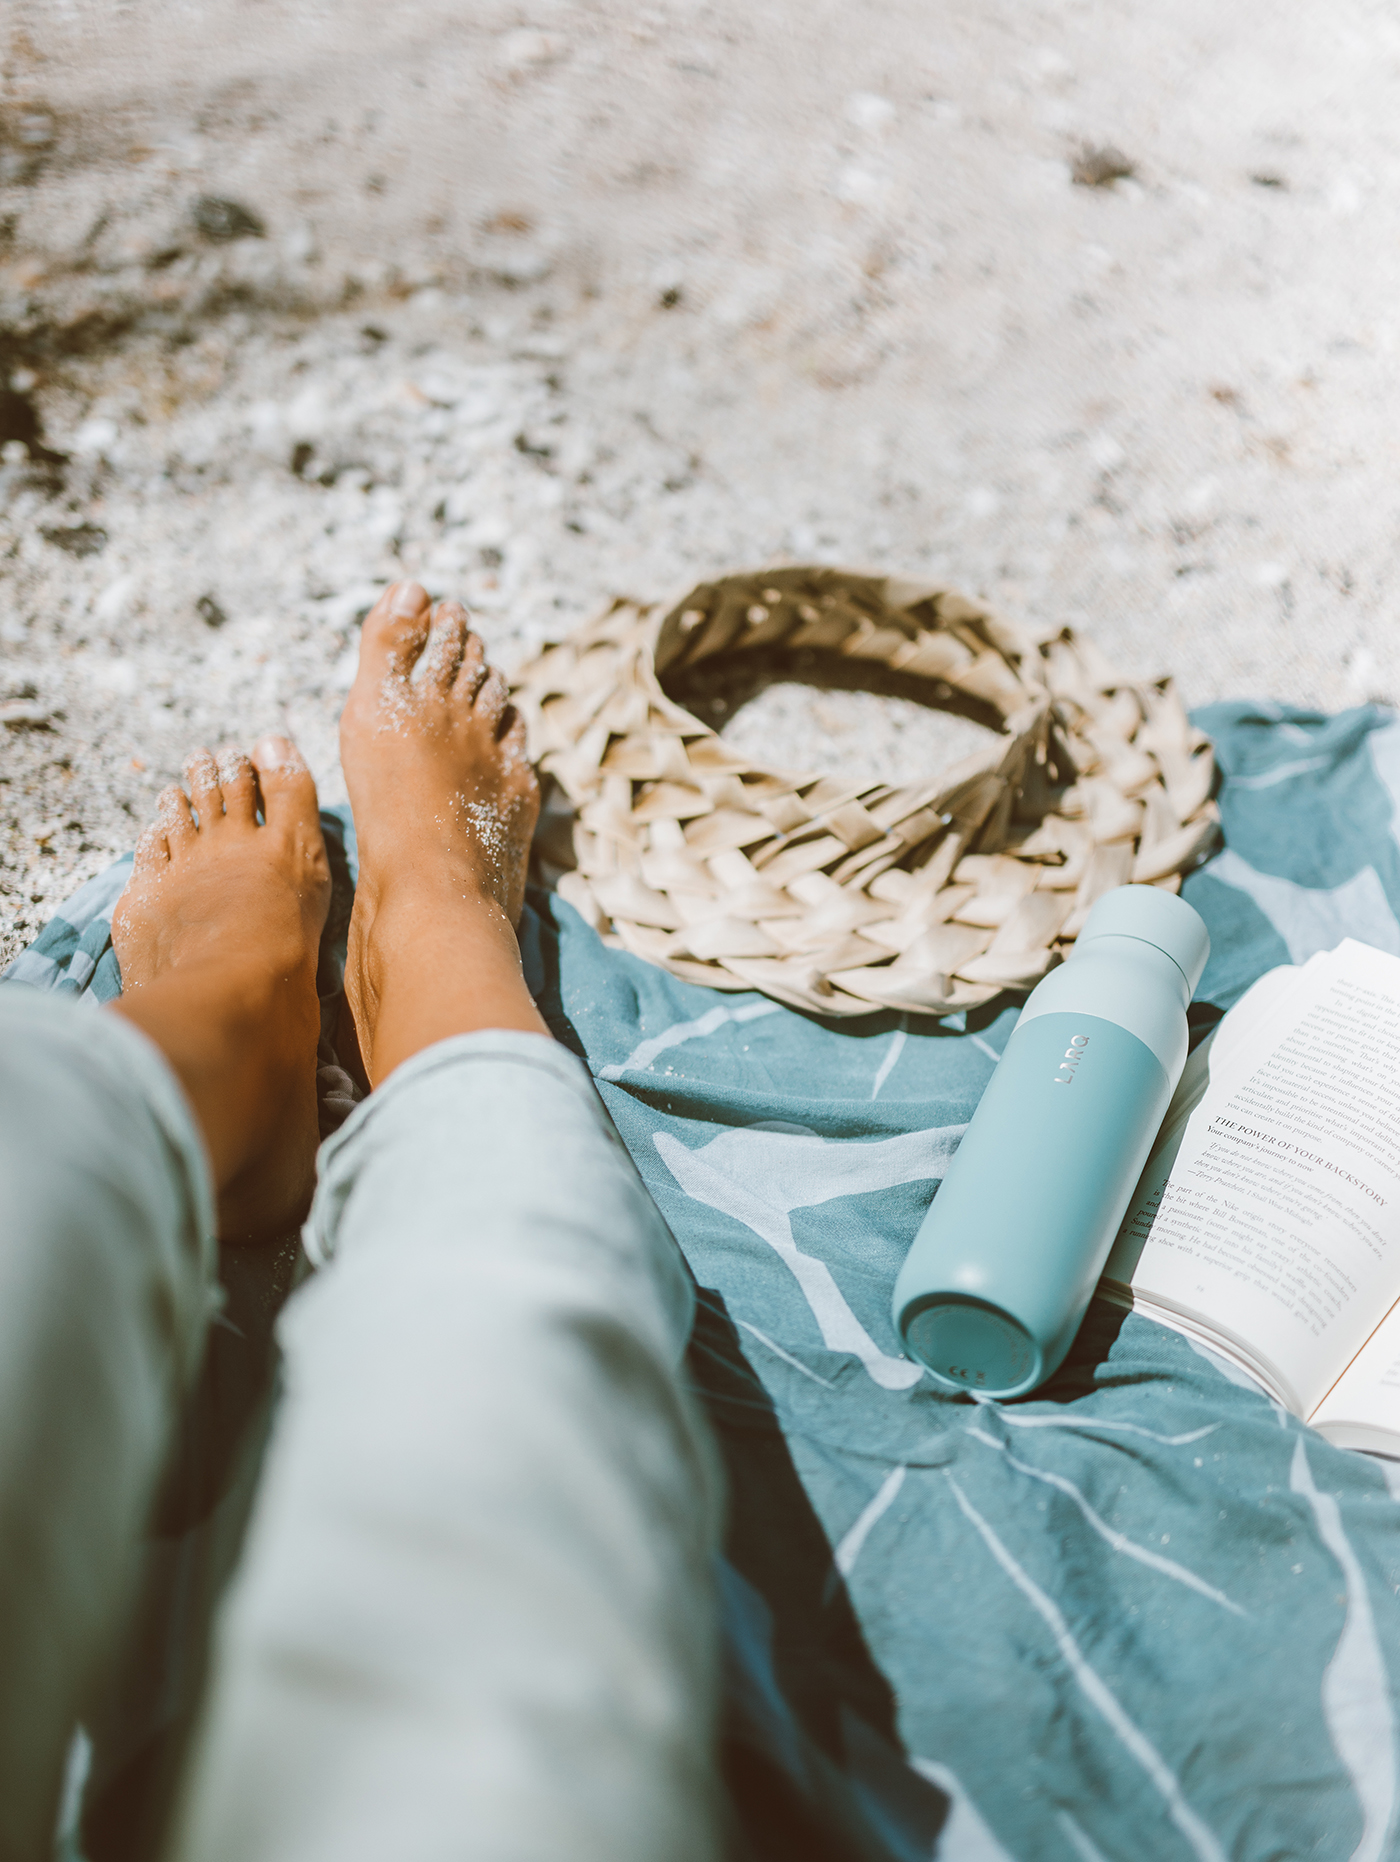 Elana Jadallah sits on blue beach towel with her seaside mint LARQ Bottle